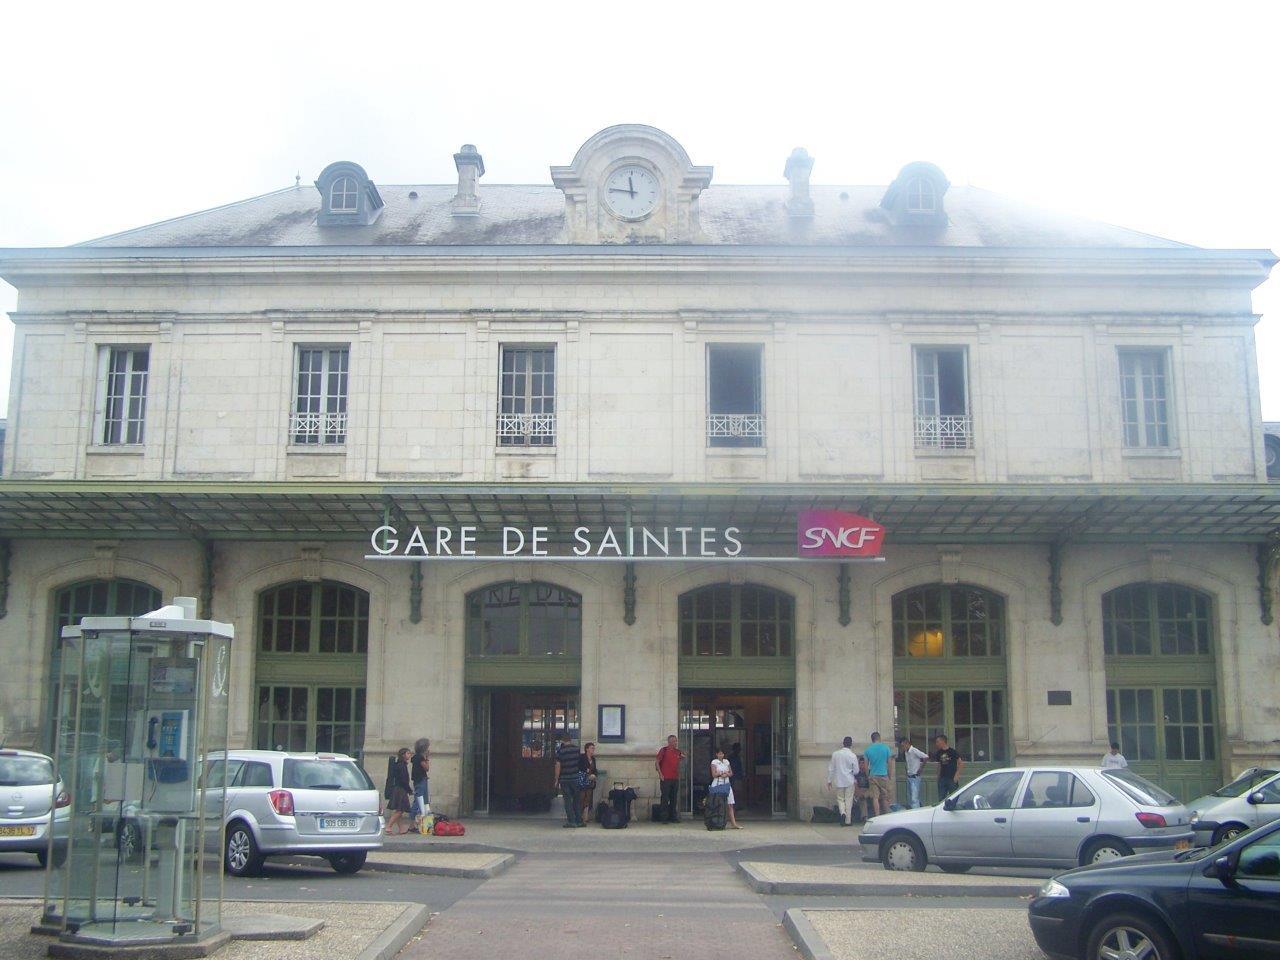 gare-de-saintes-train-station